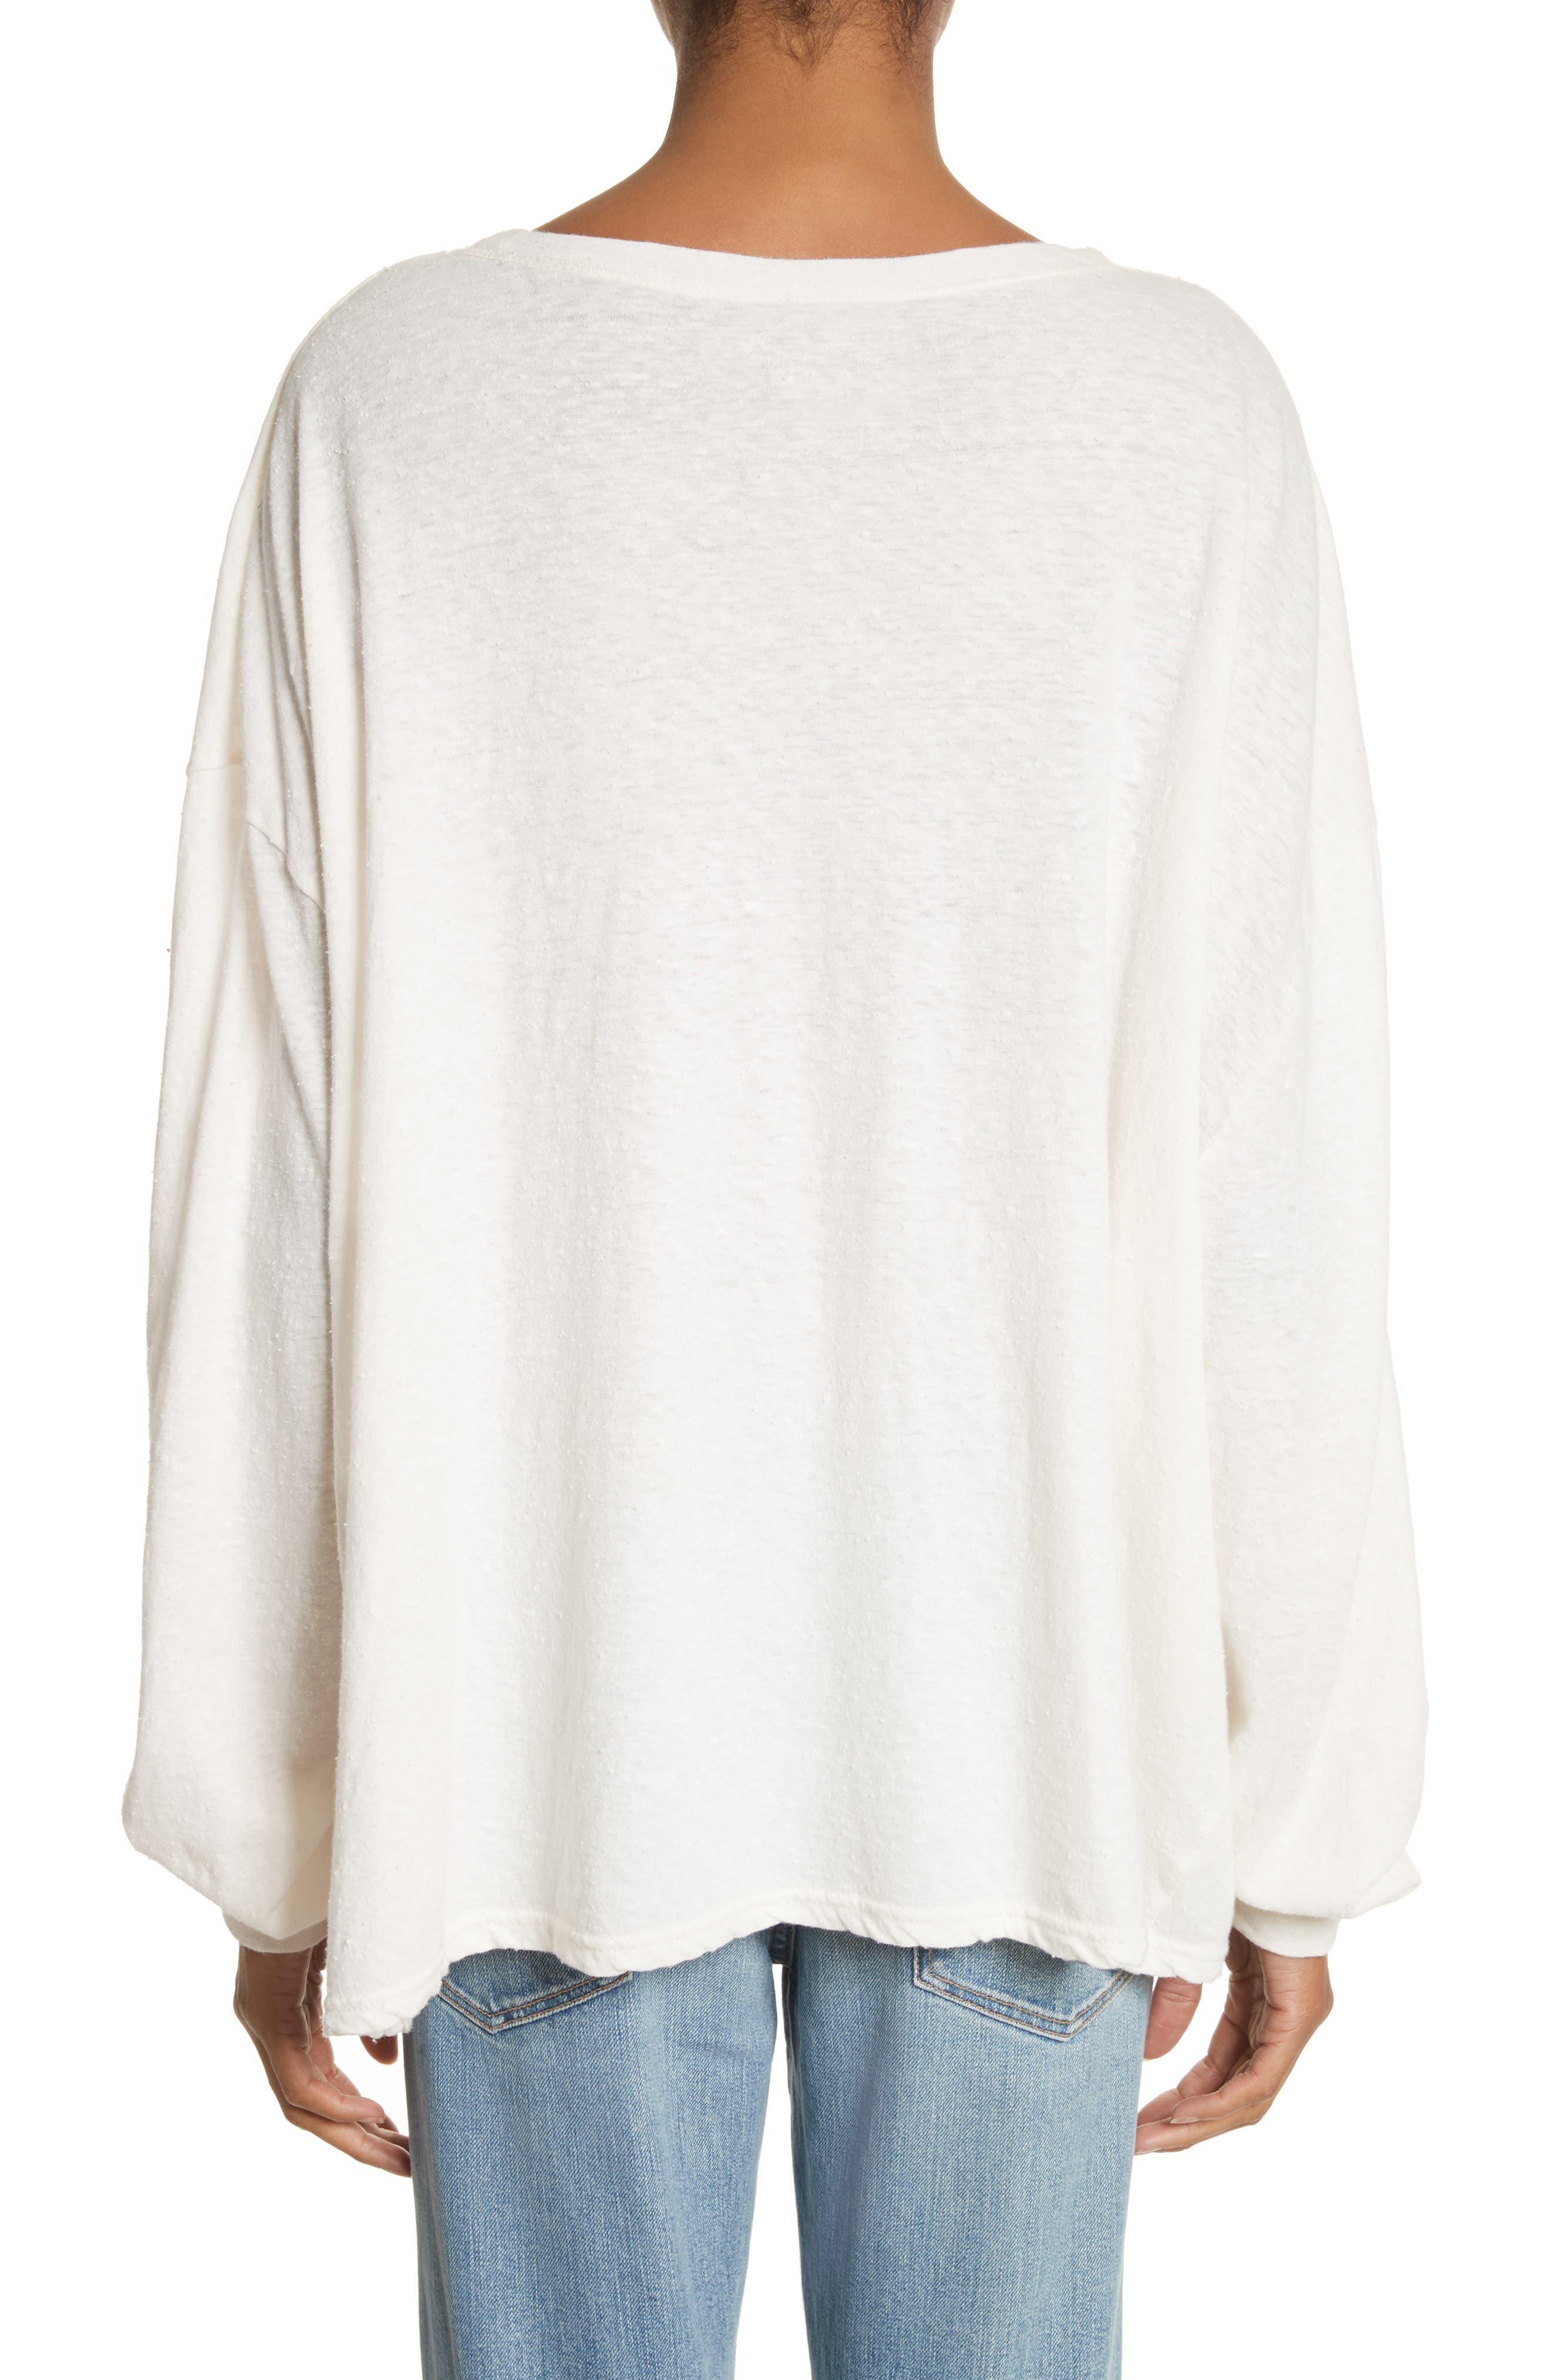 Solano Oversize Cotton Top,                             Alternate thumbnail 2, color,                             White